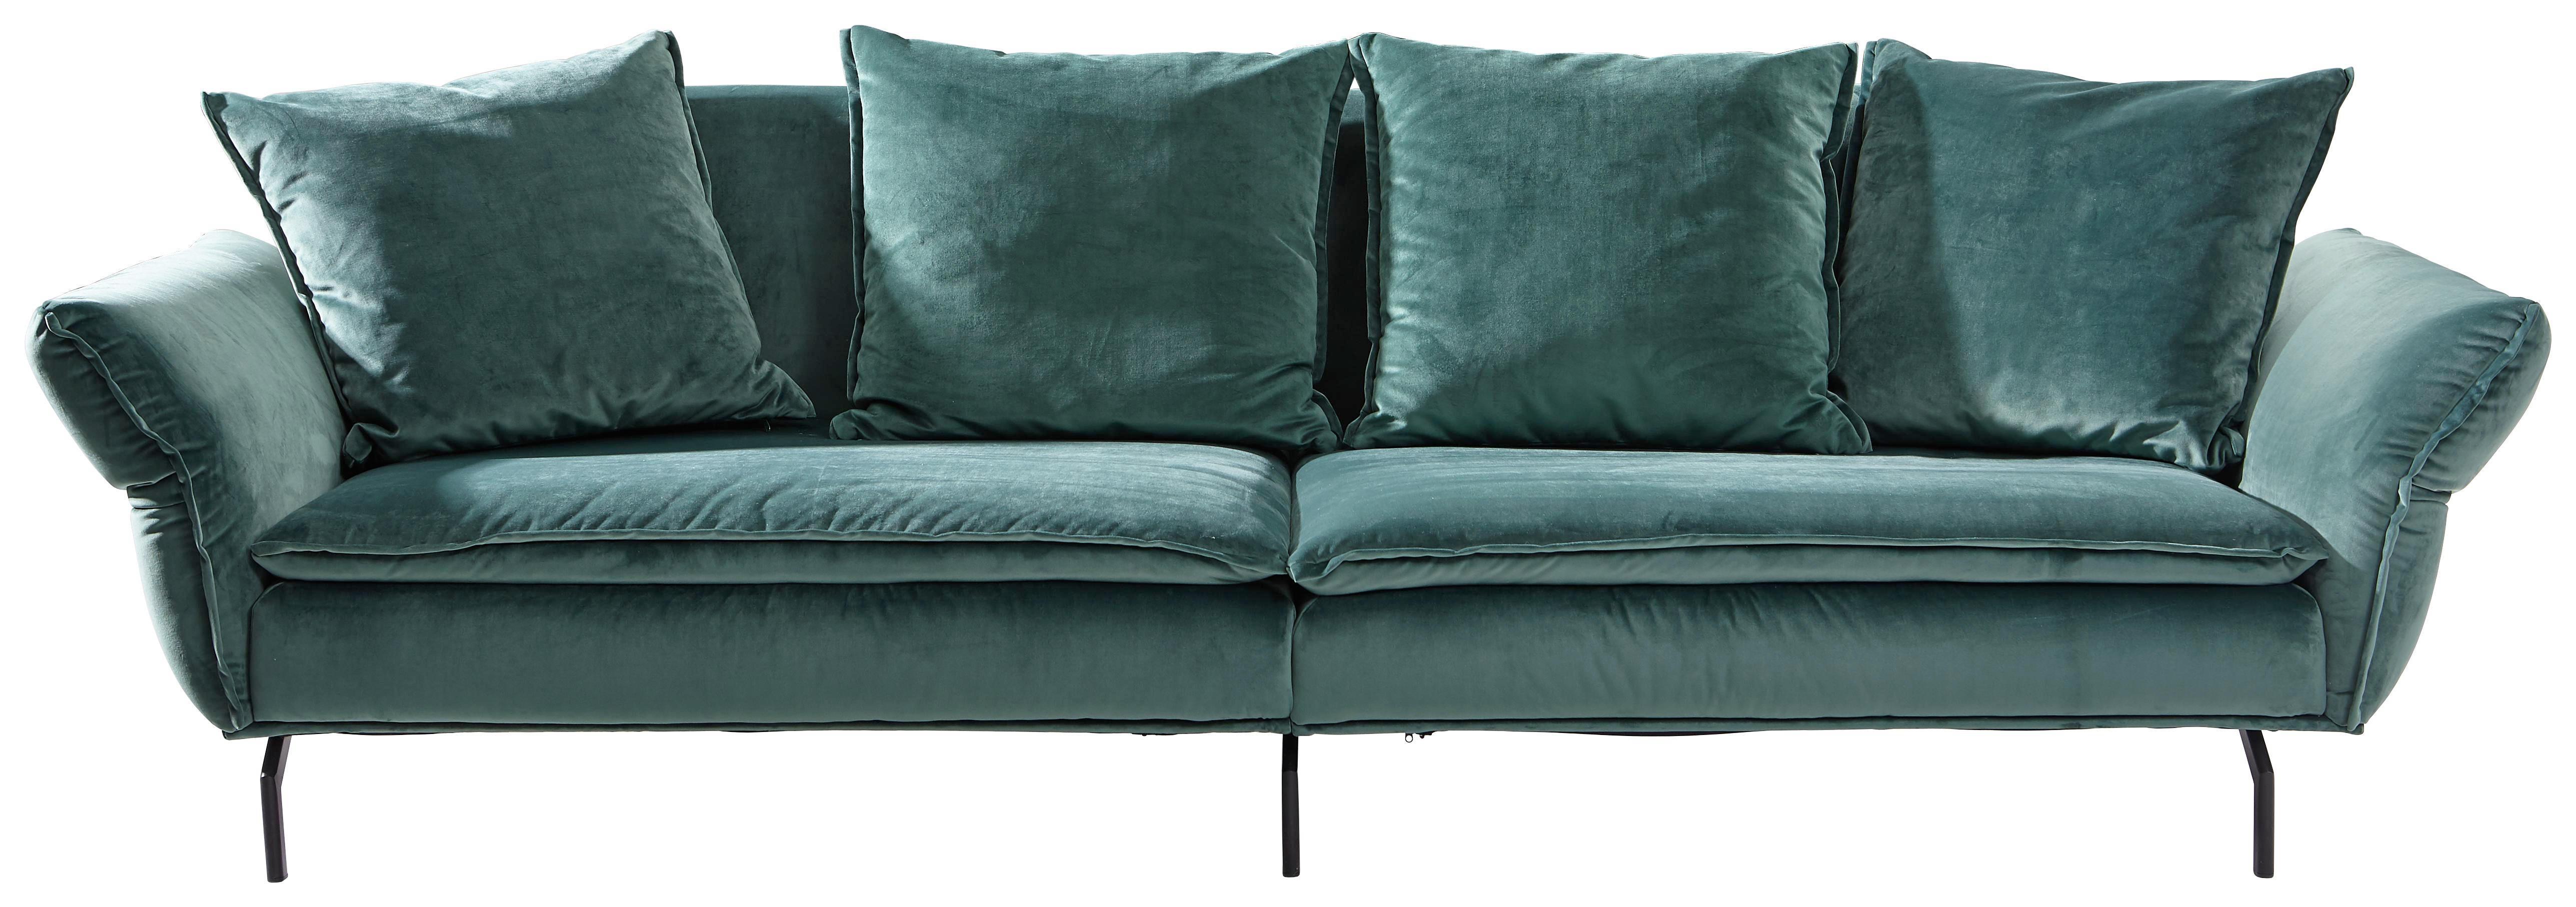 Bigsofas Xxl Sofas Fur Maximalen Komfort